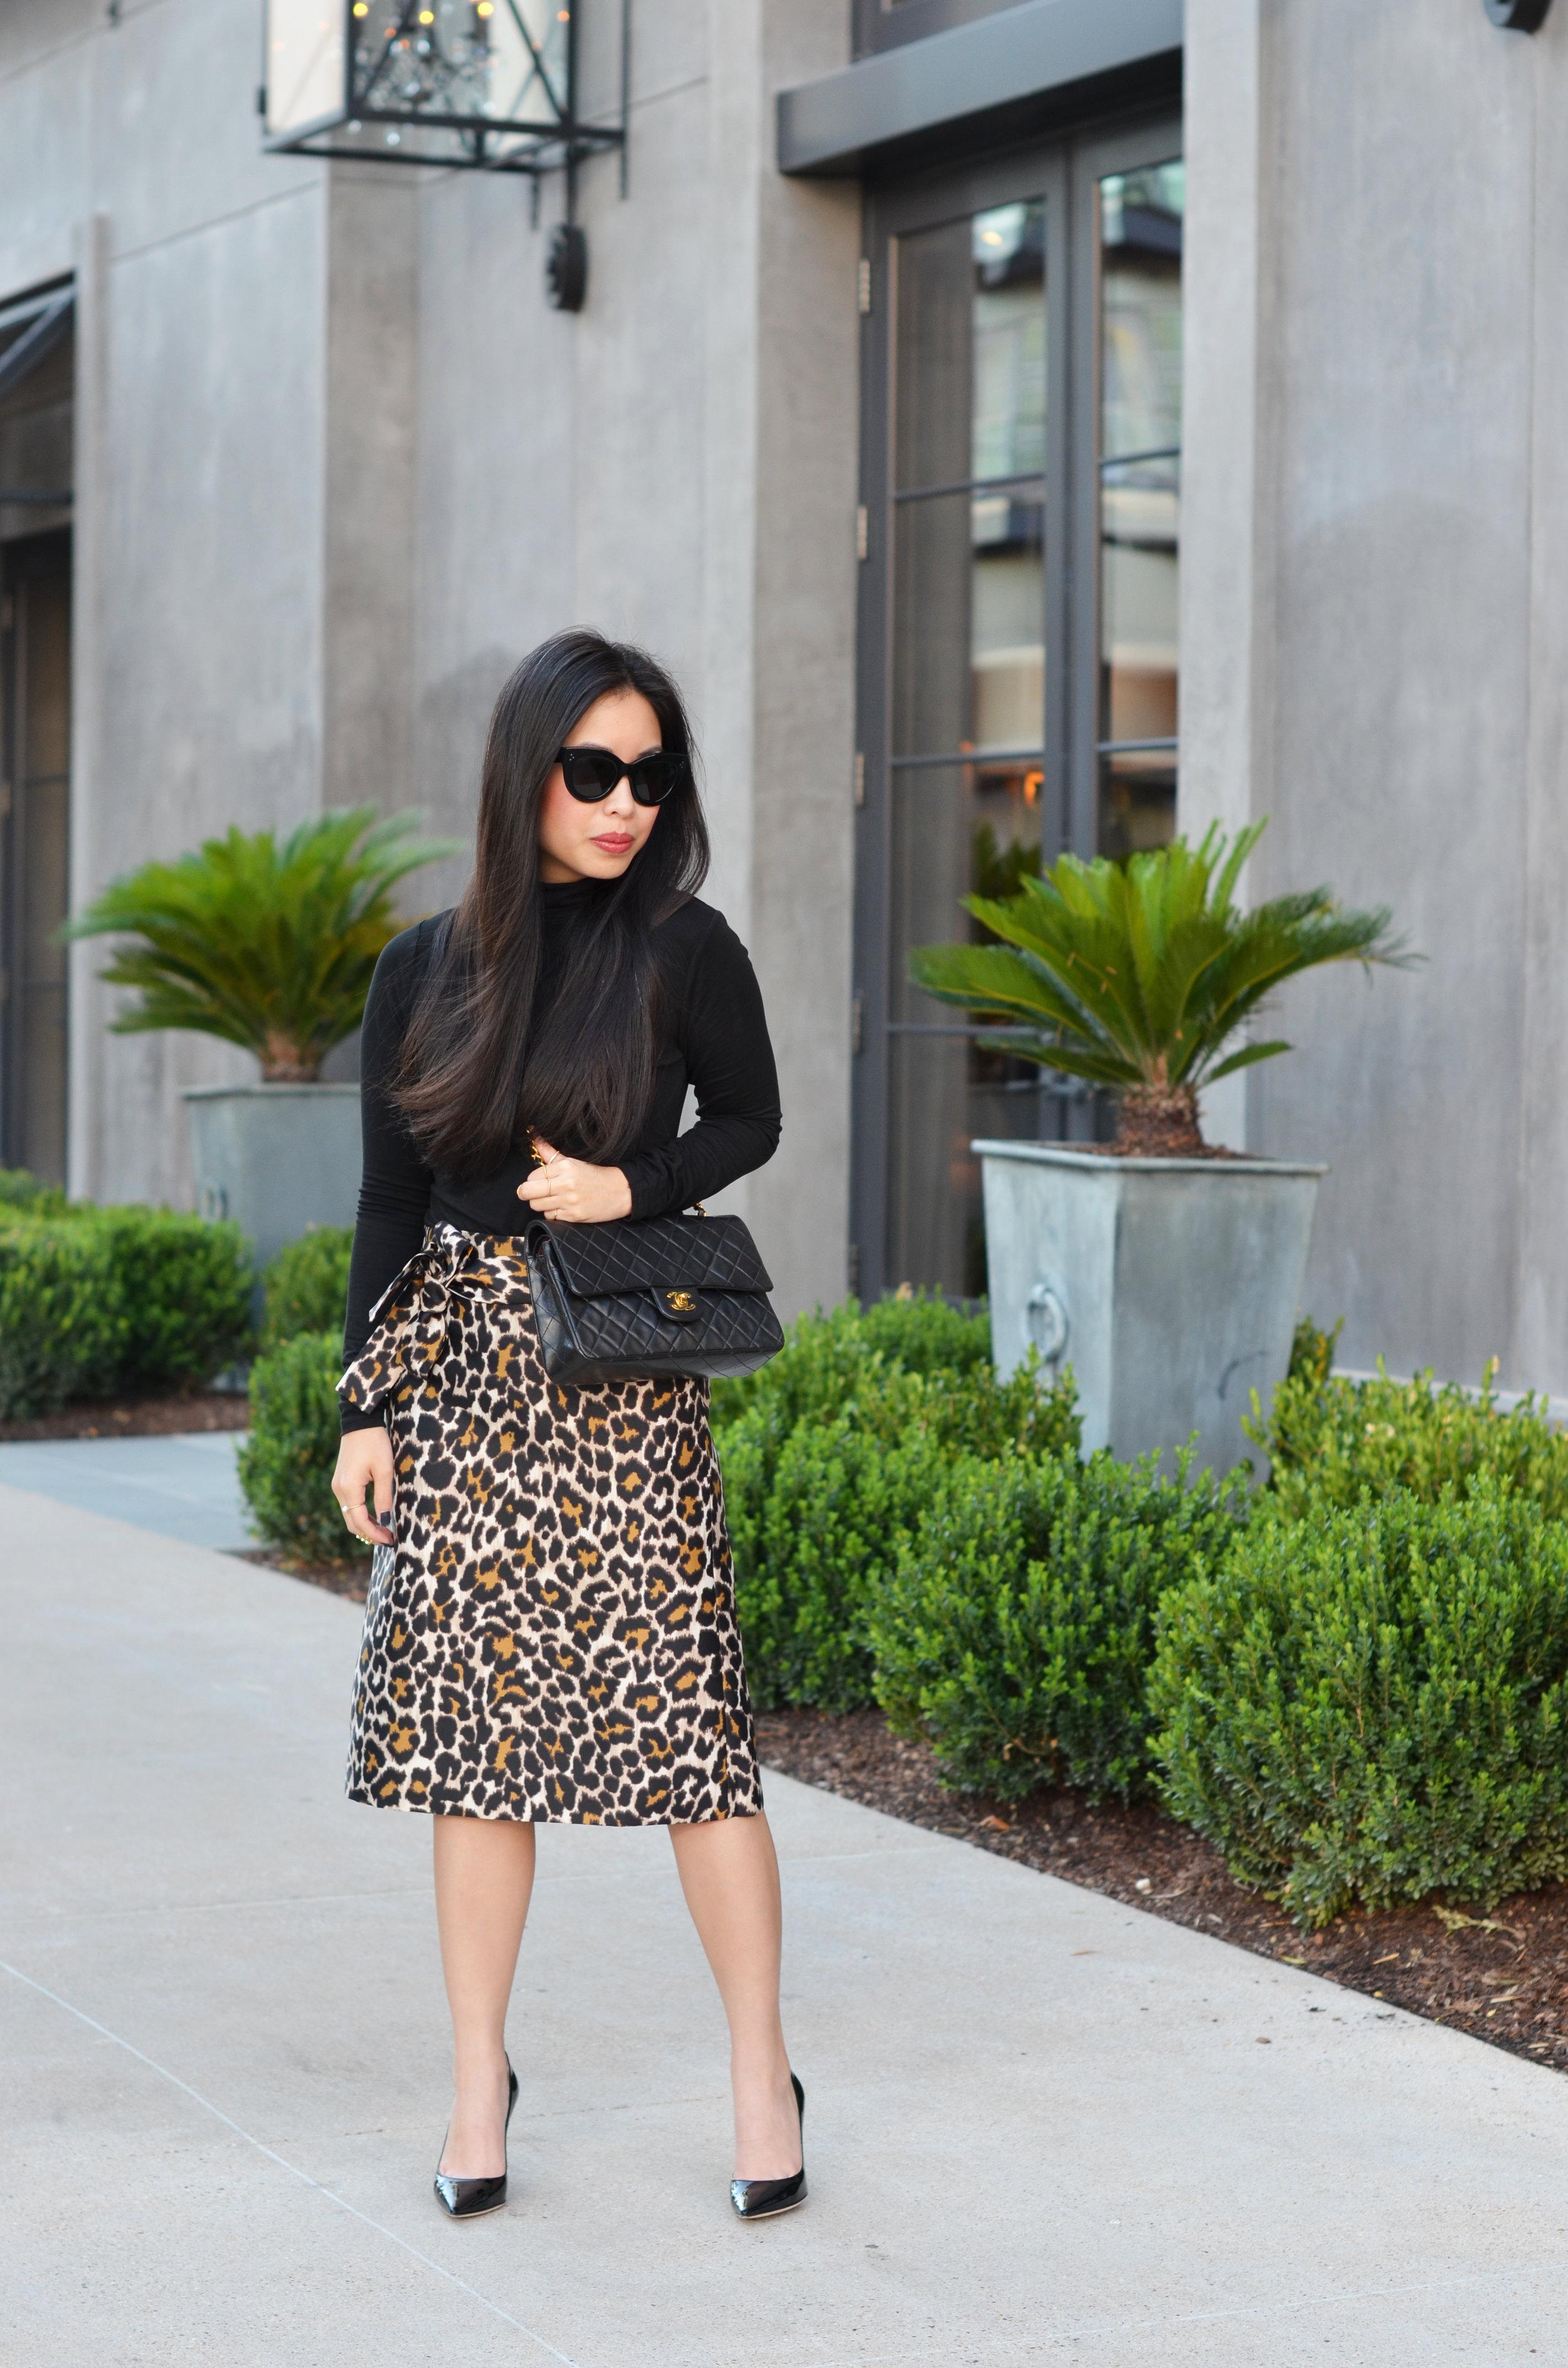 the-leopard-print-skirt-jannadoan.com